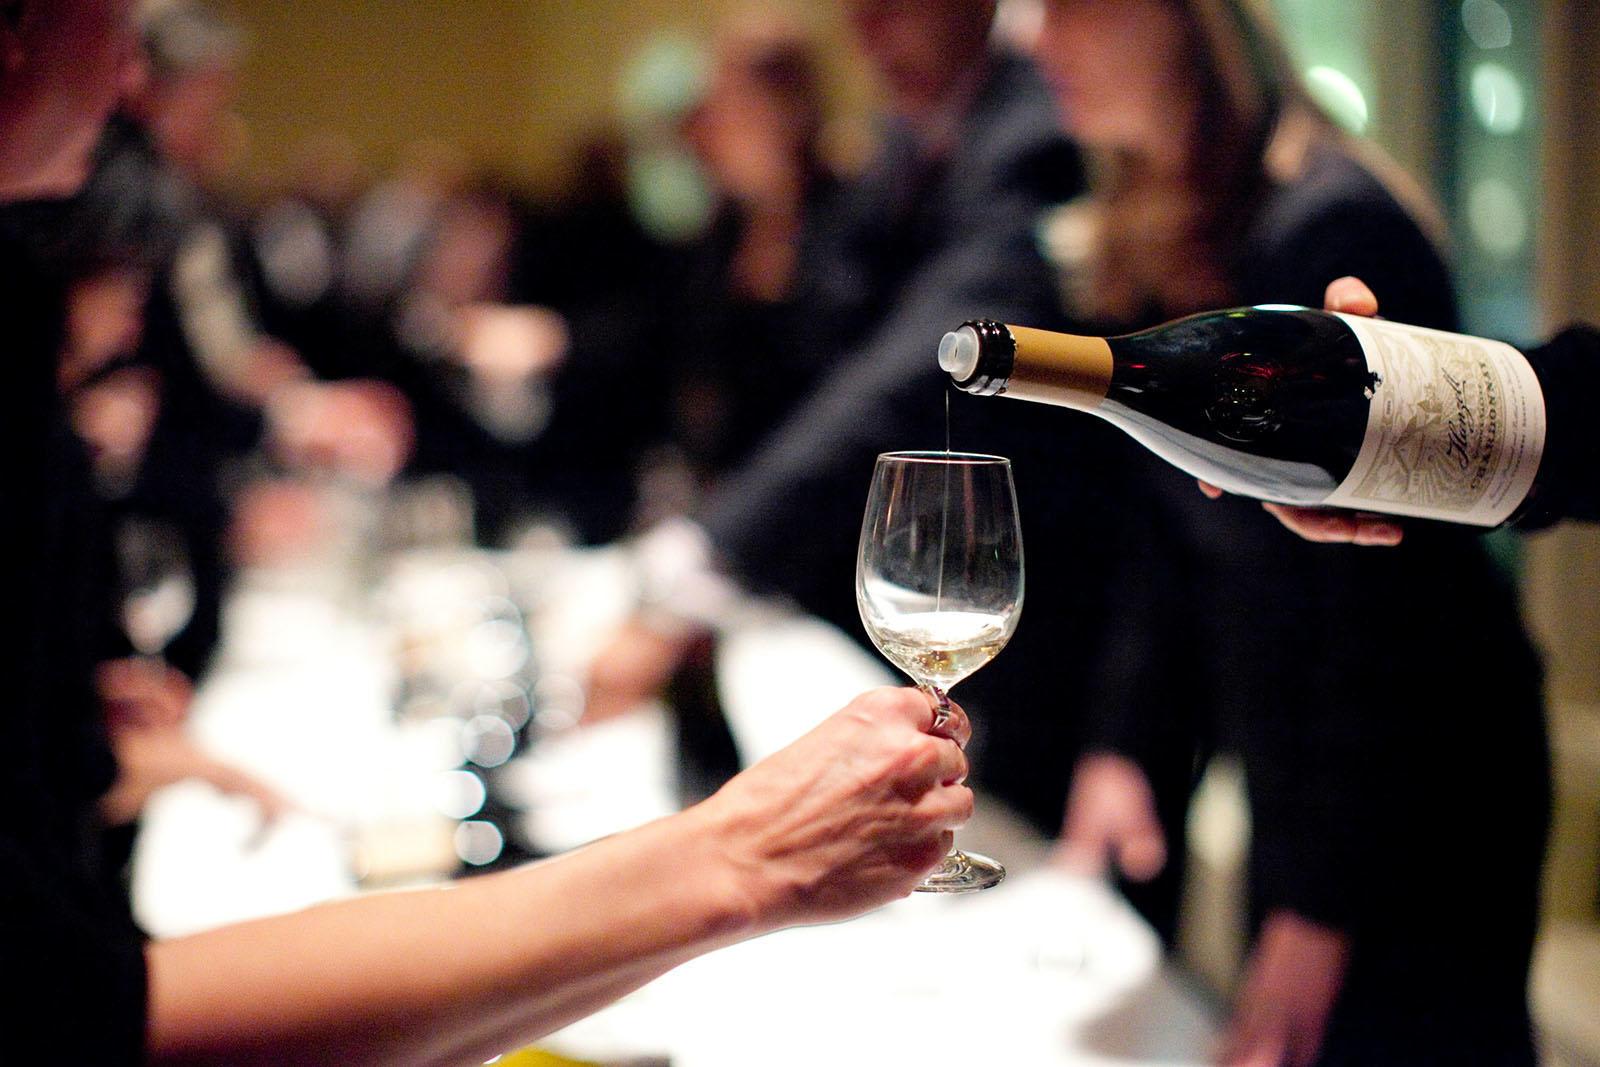 Naples Winter Wine Festival - Celebrating 20 Years